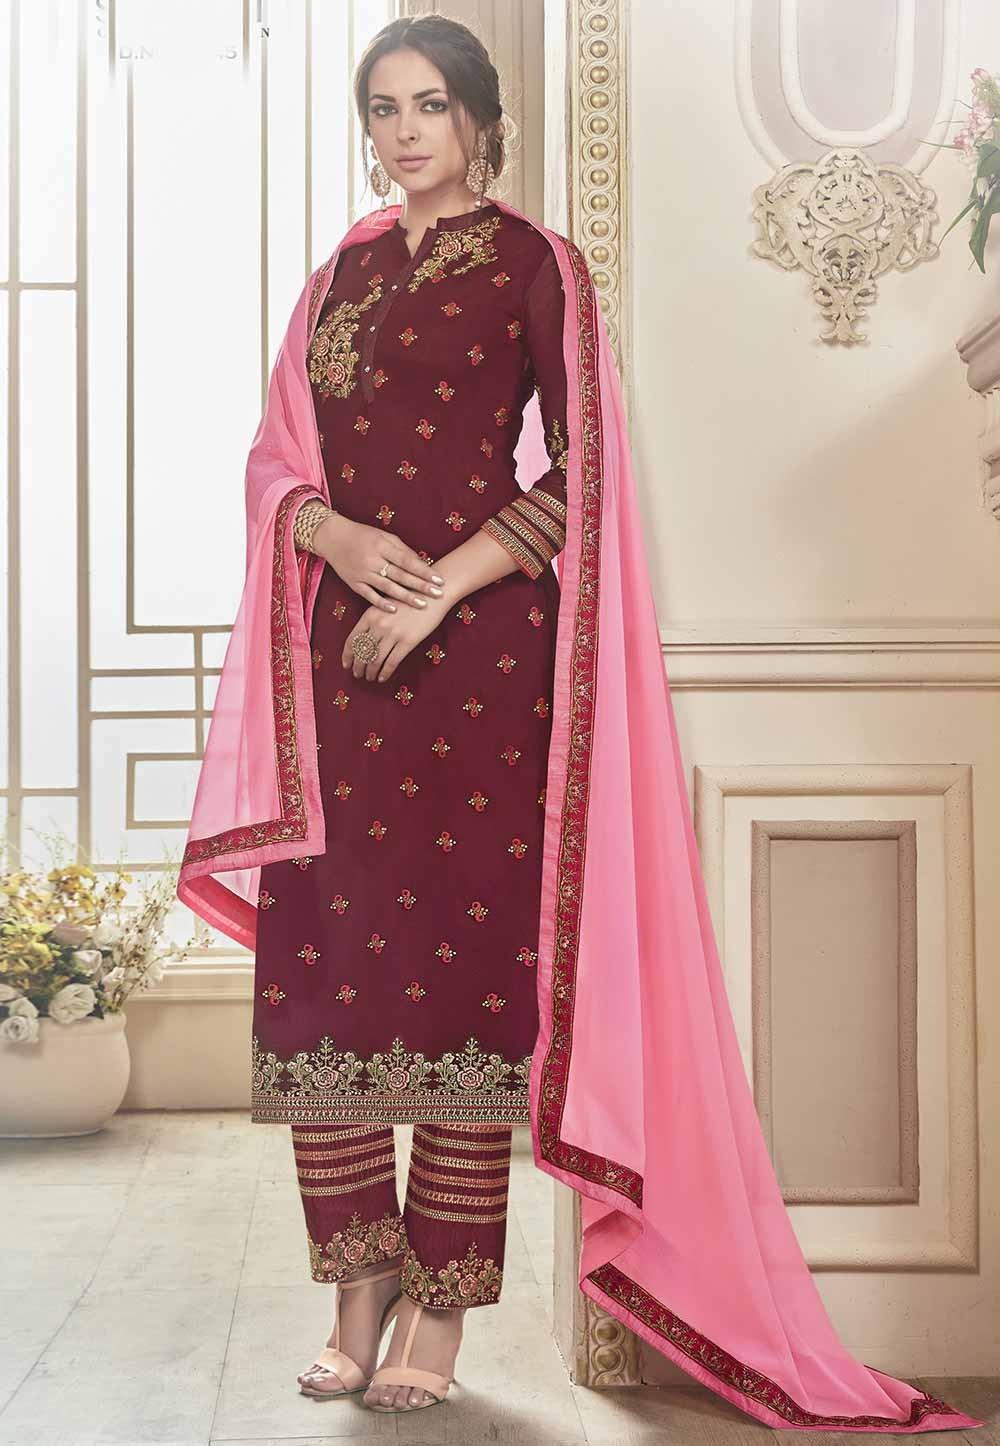 Attractive Looking Maroon Color Georgette Fabric Designer Salwar Kameez in Embroidery Work